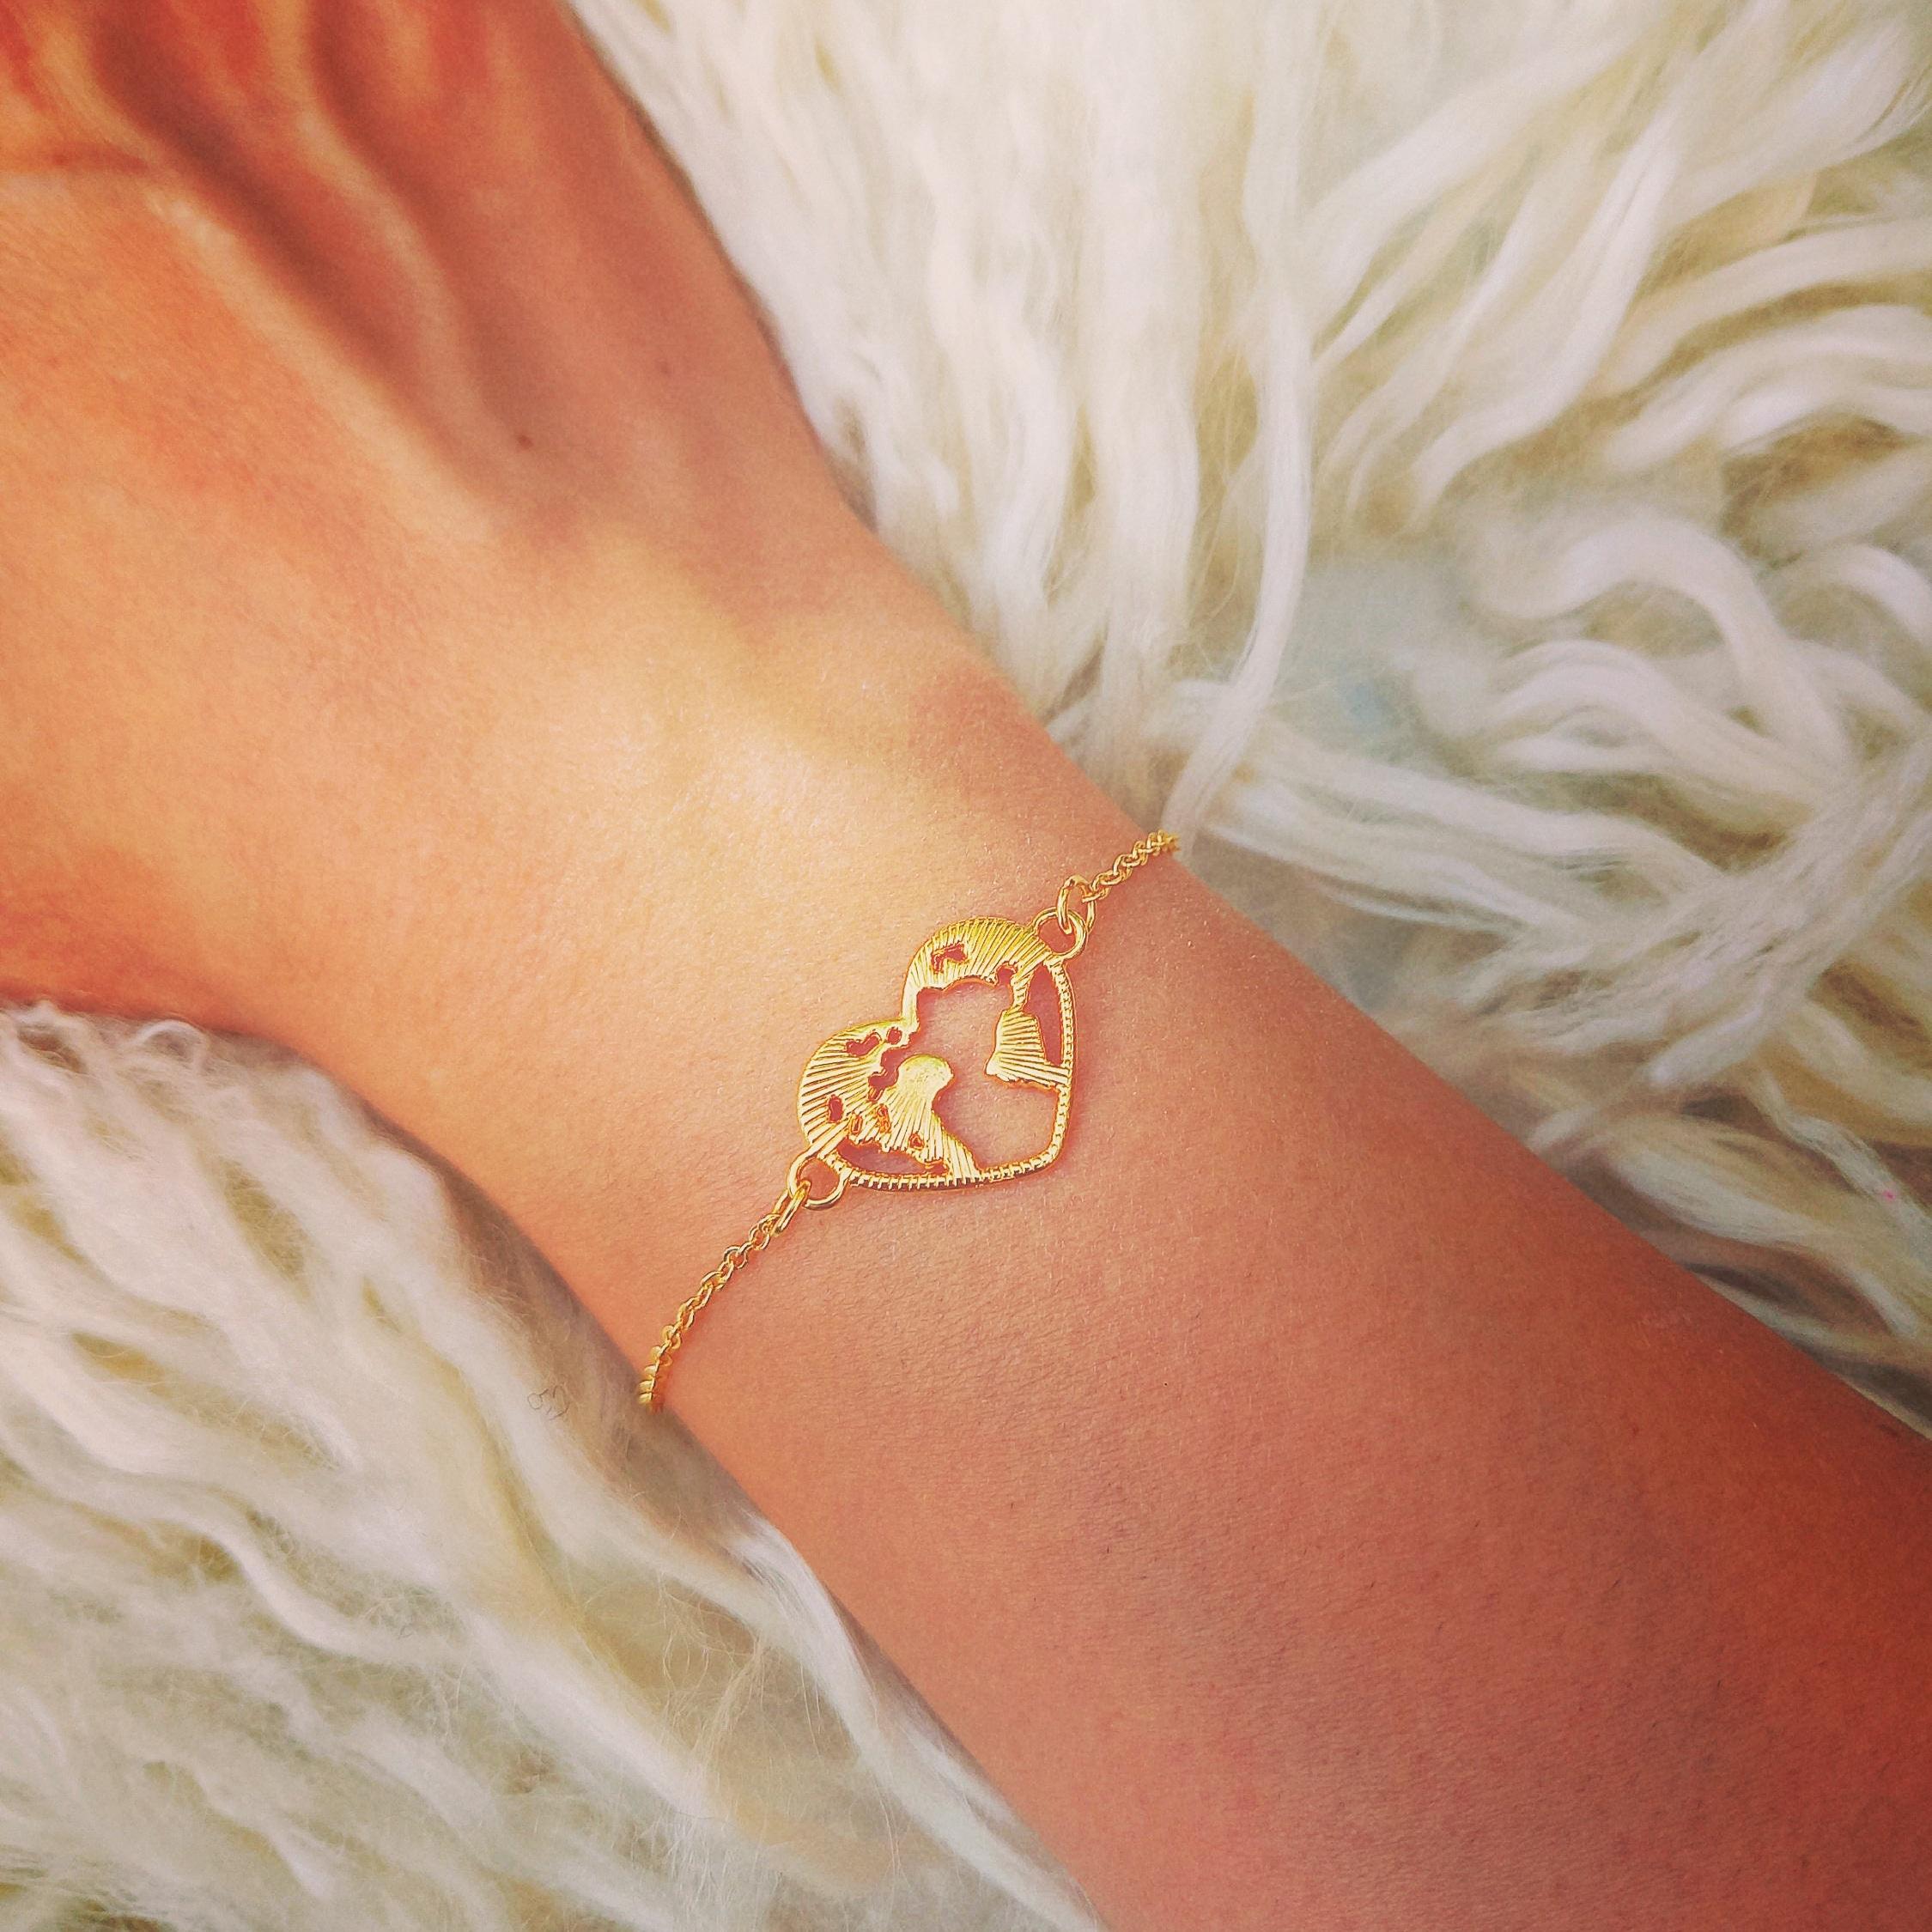 Laura Loves Jewellery